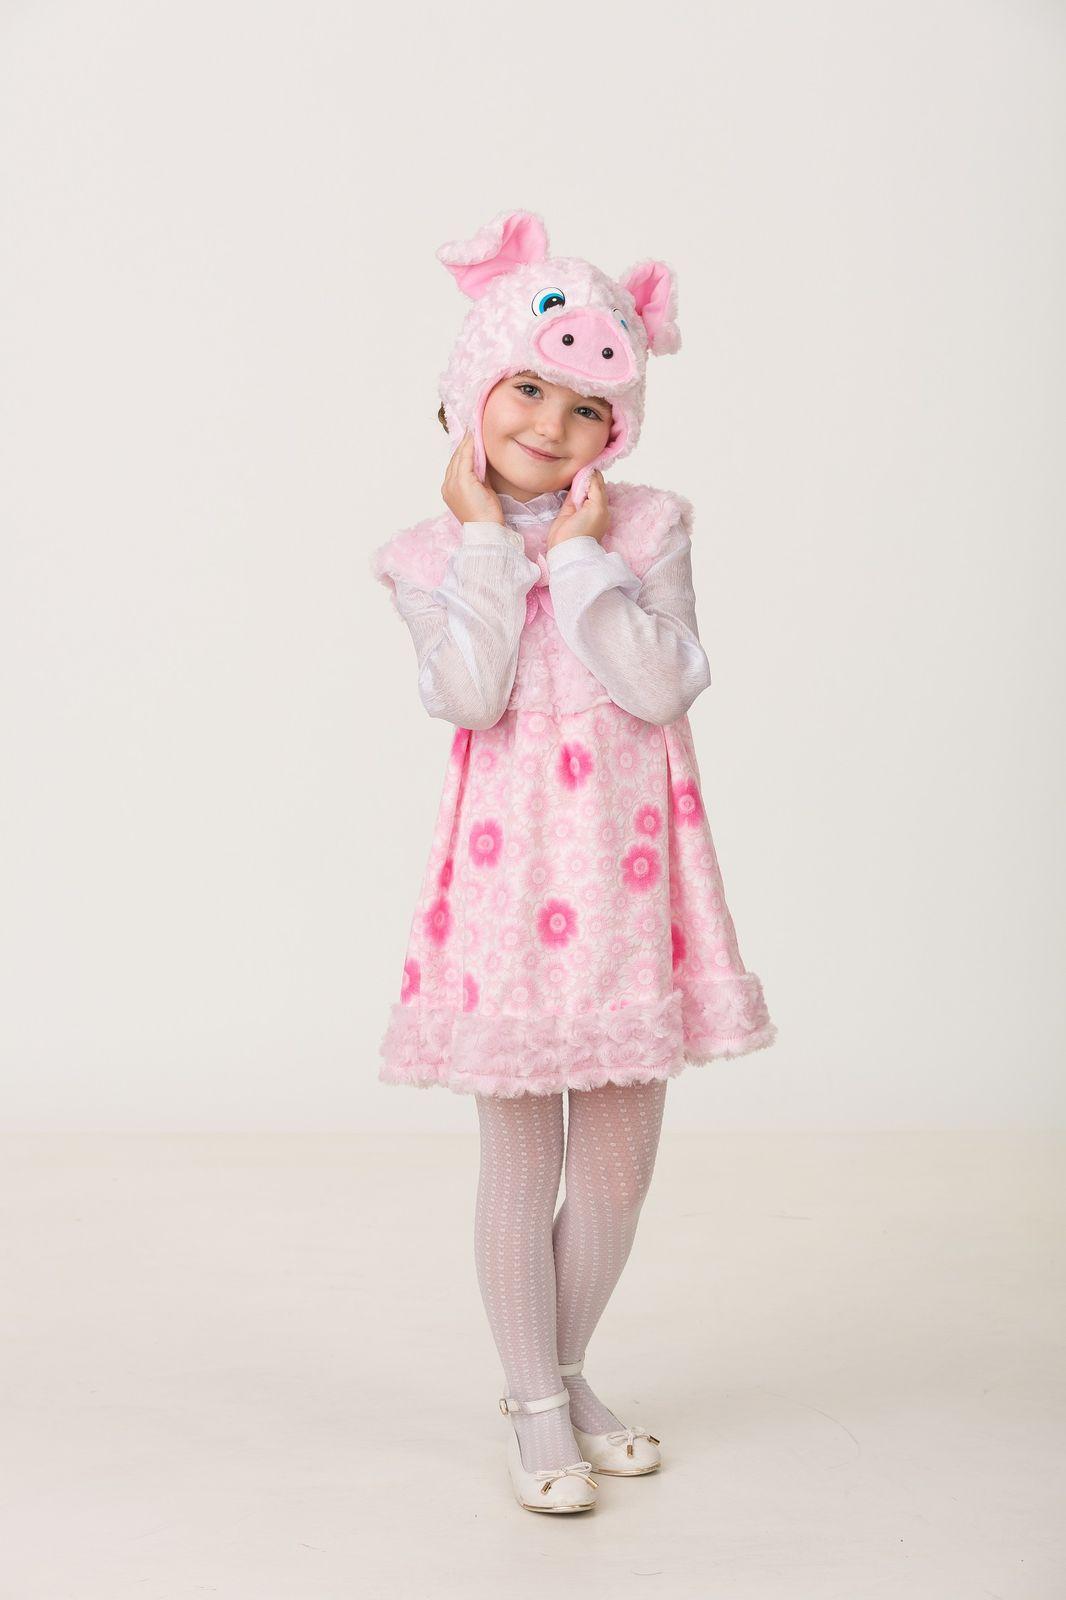 Карнавальный костюм Jeanees Свинка Бетта, цвет: розовый. Размер: 28 карнавальный костюм jeanees мышонок масик цвет серый размер 24